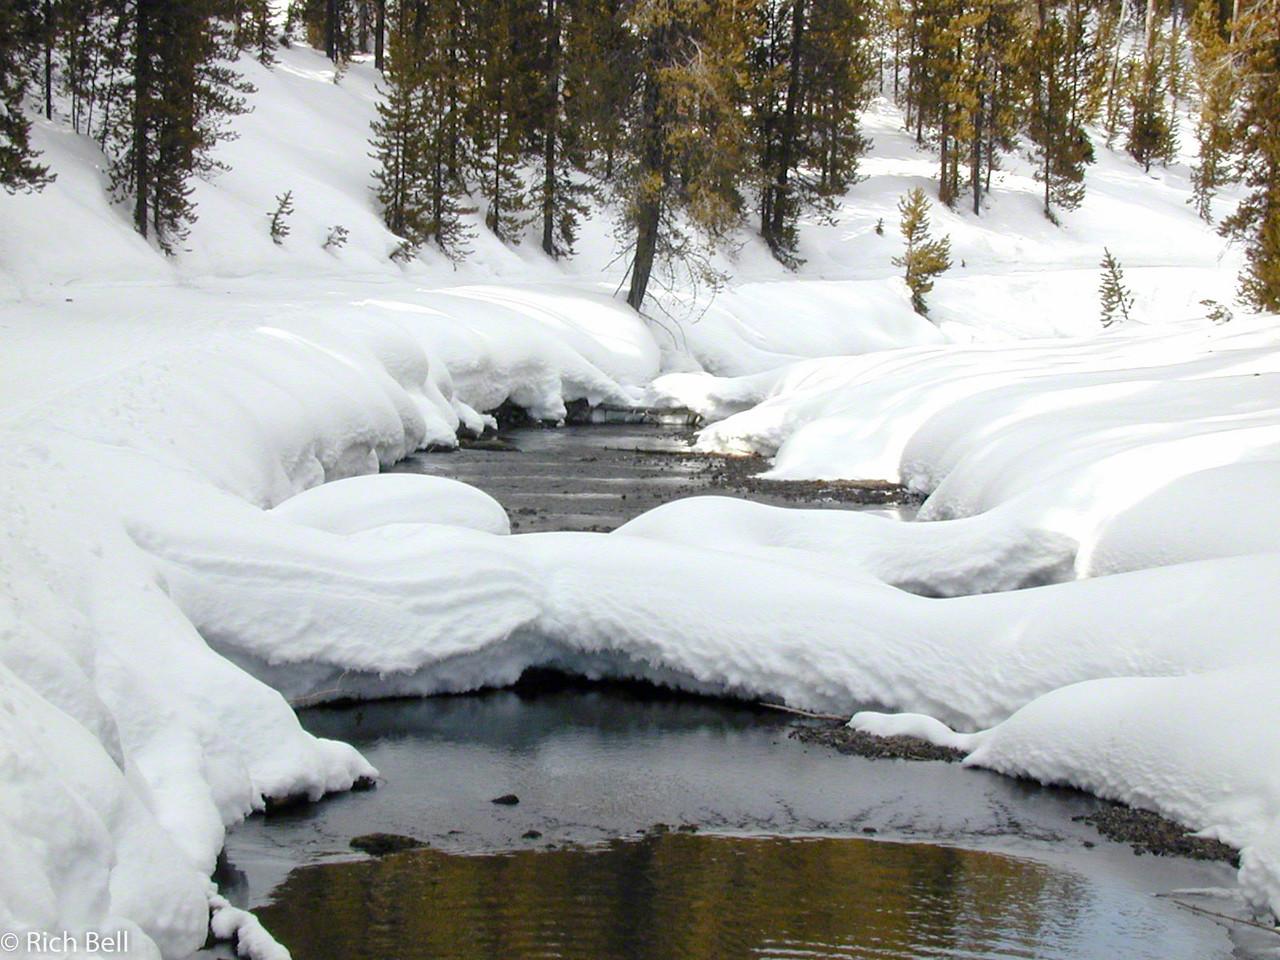 20100721River in Idaho near Yellowstone 130063